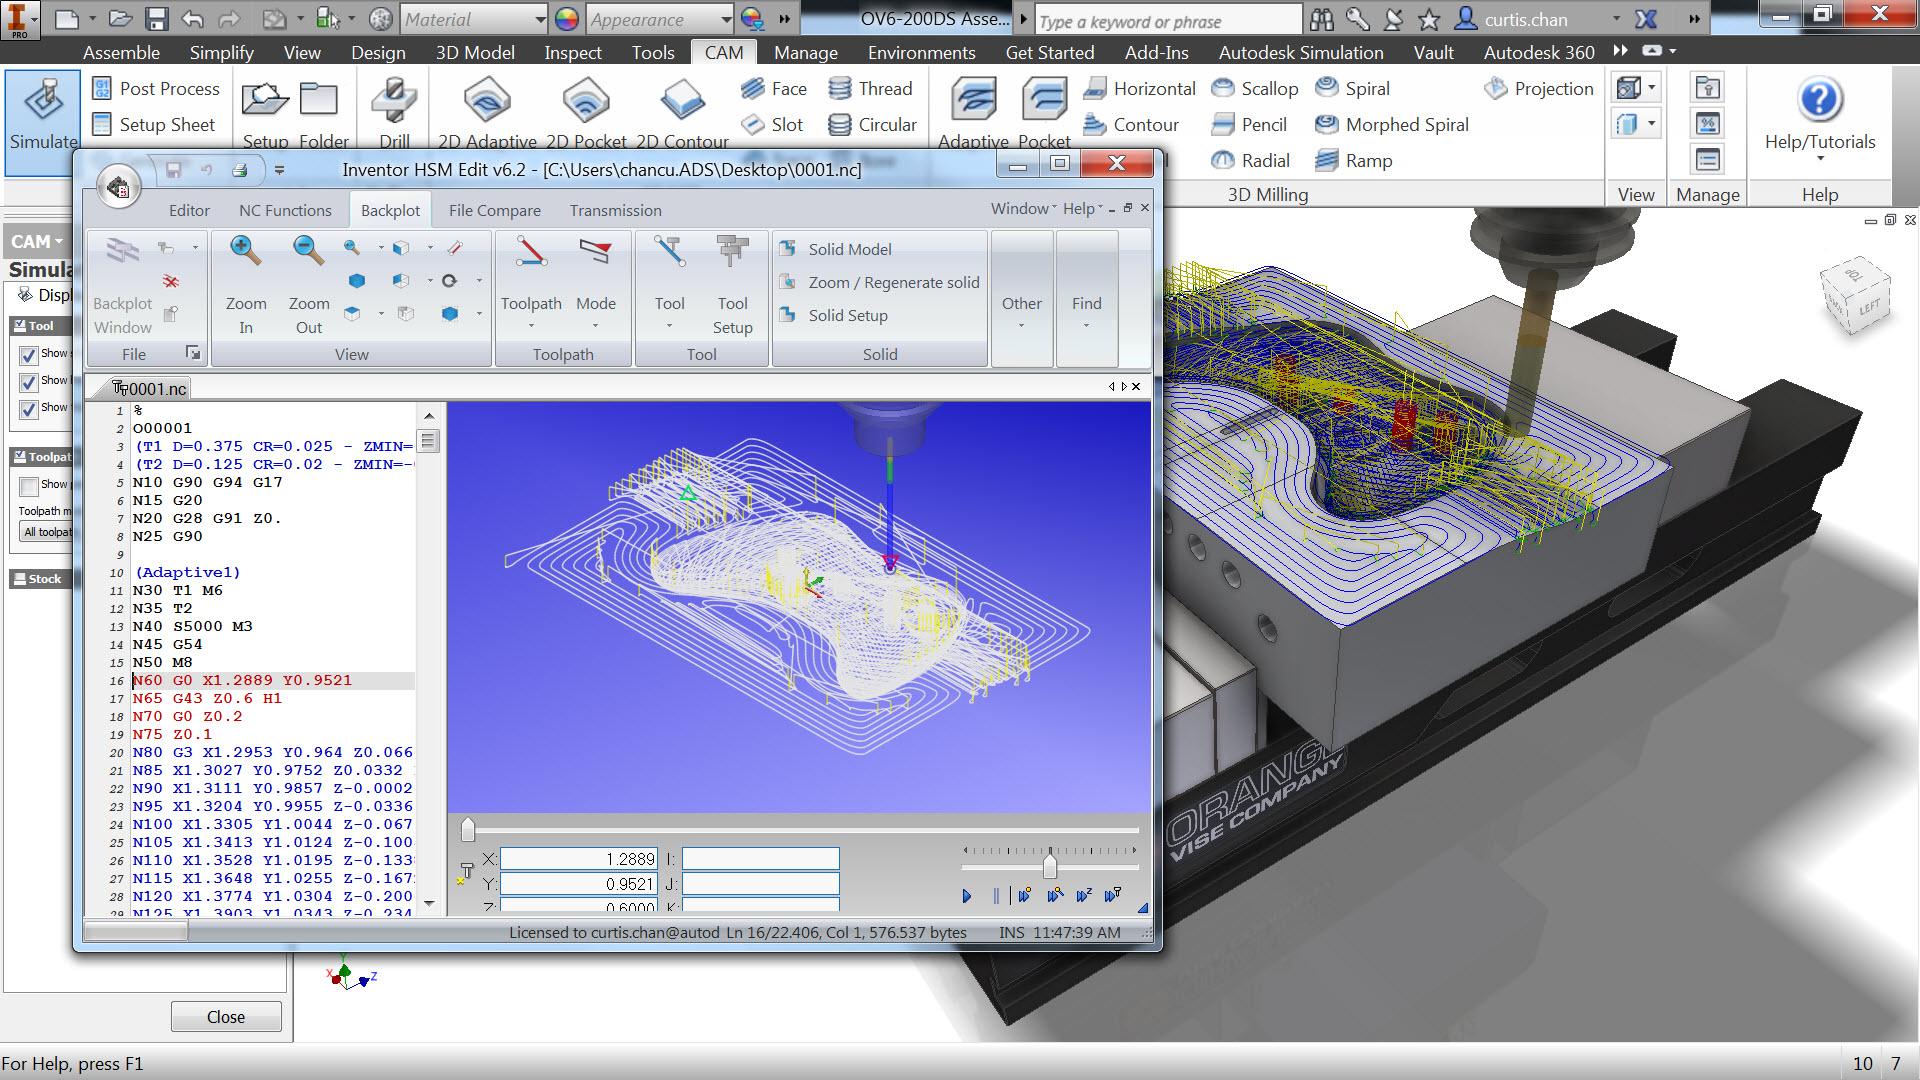 Autodesk to bundle Nastran simulation and manufacturing